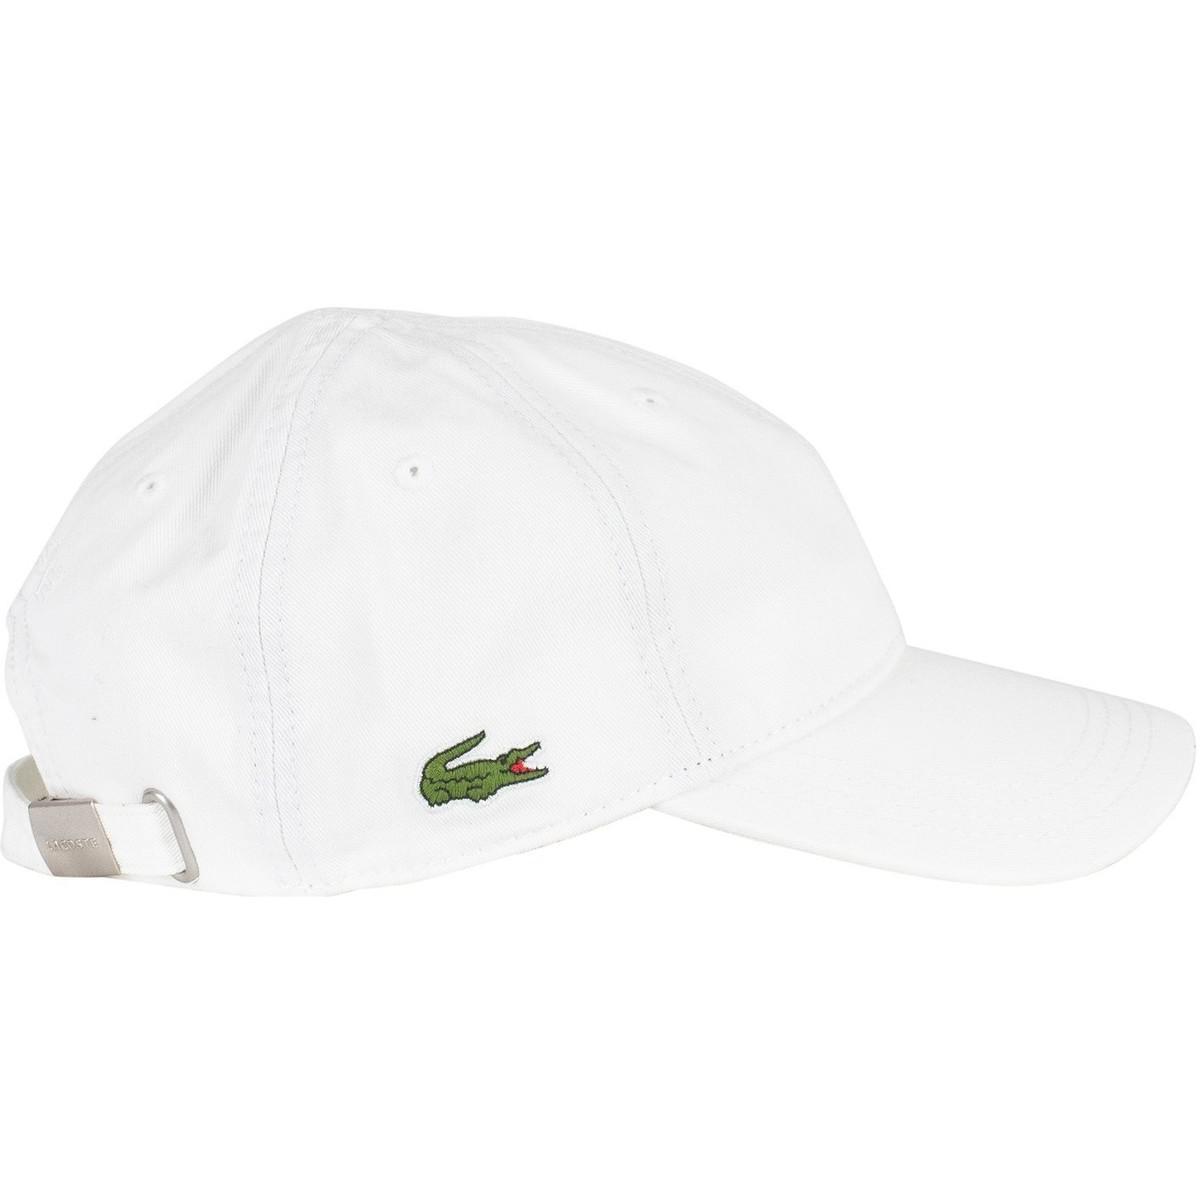 Lacoste - Men s Small Logo Baseball Cap 2d73c6a2fa5